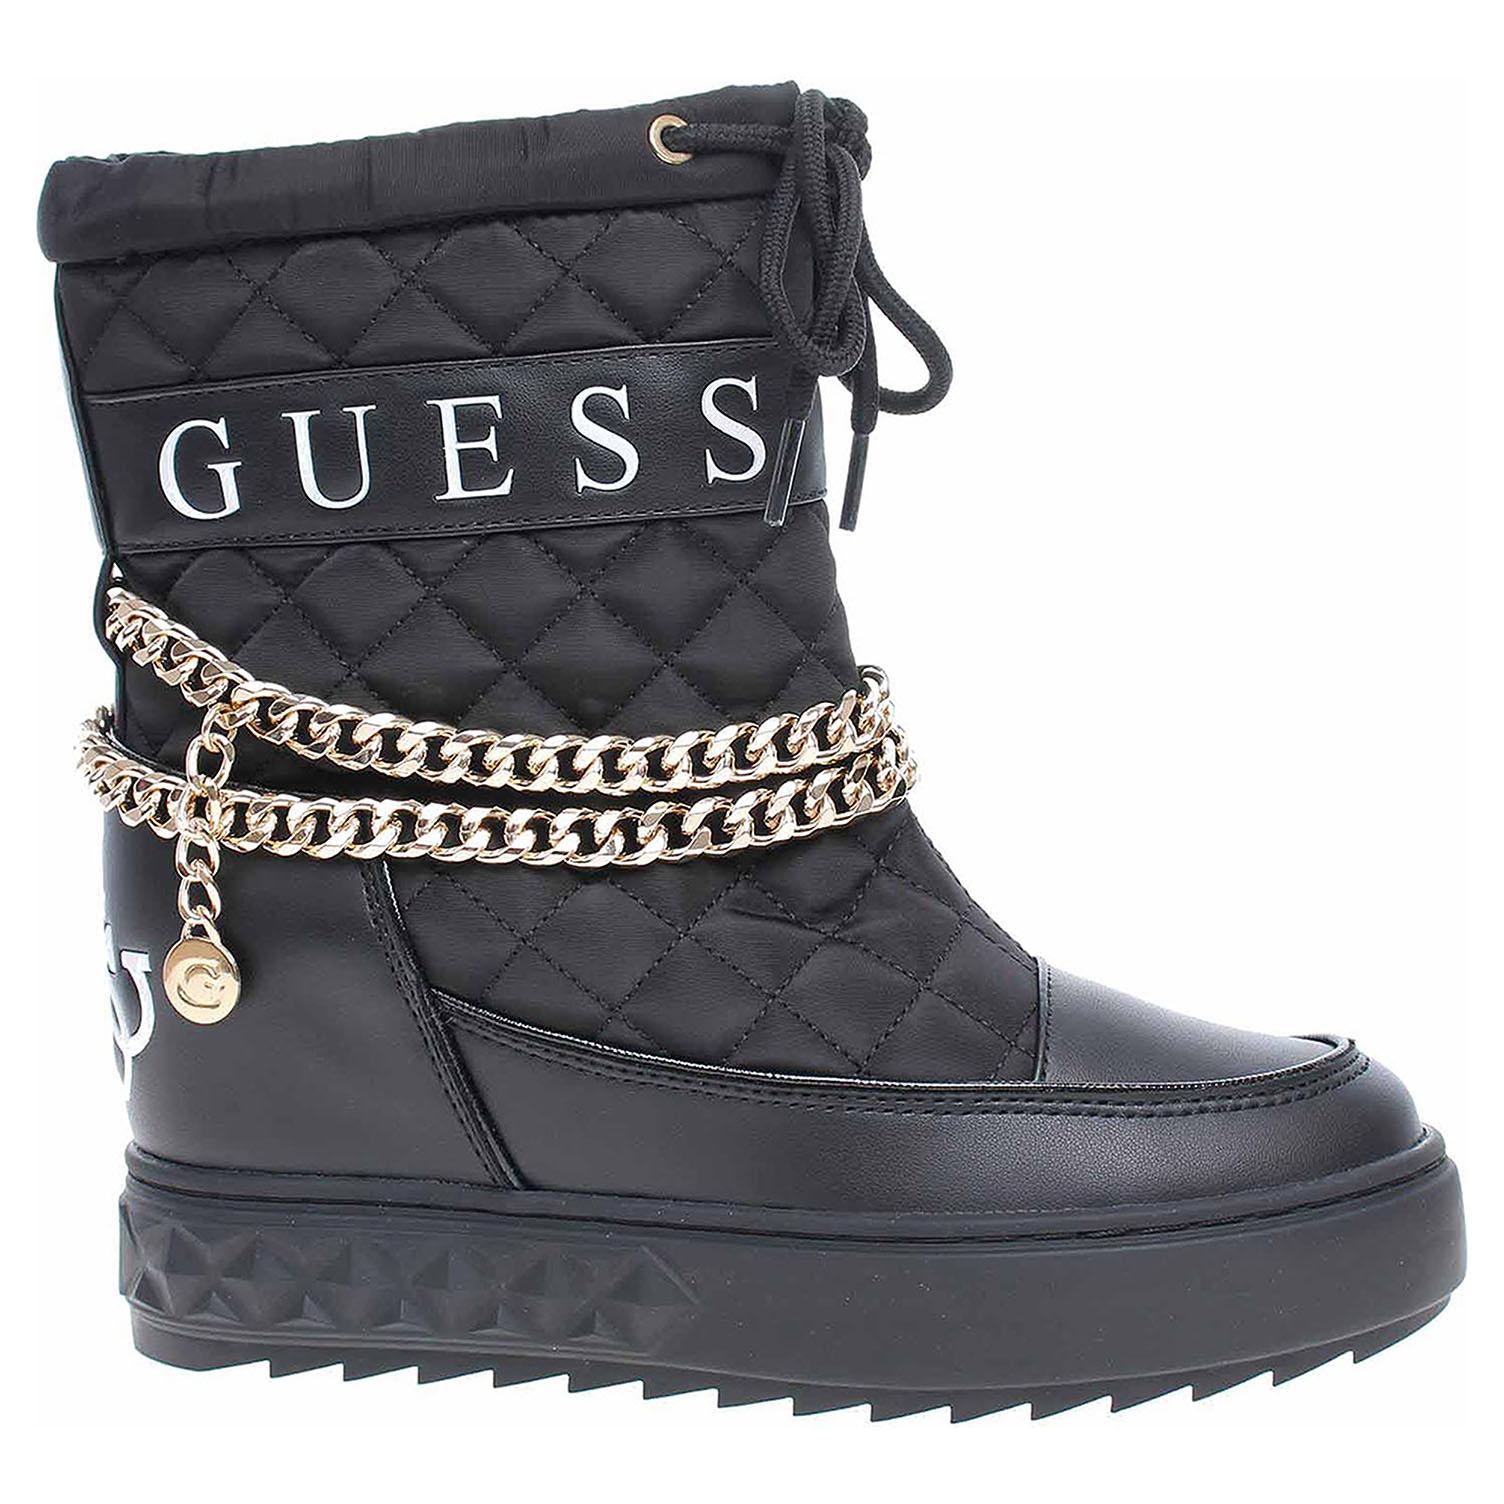 Dámská obuv Guess Fariba black FL8FRBFAB12 37